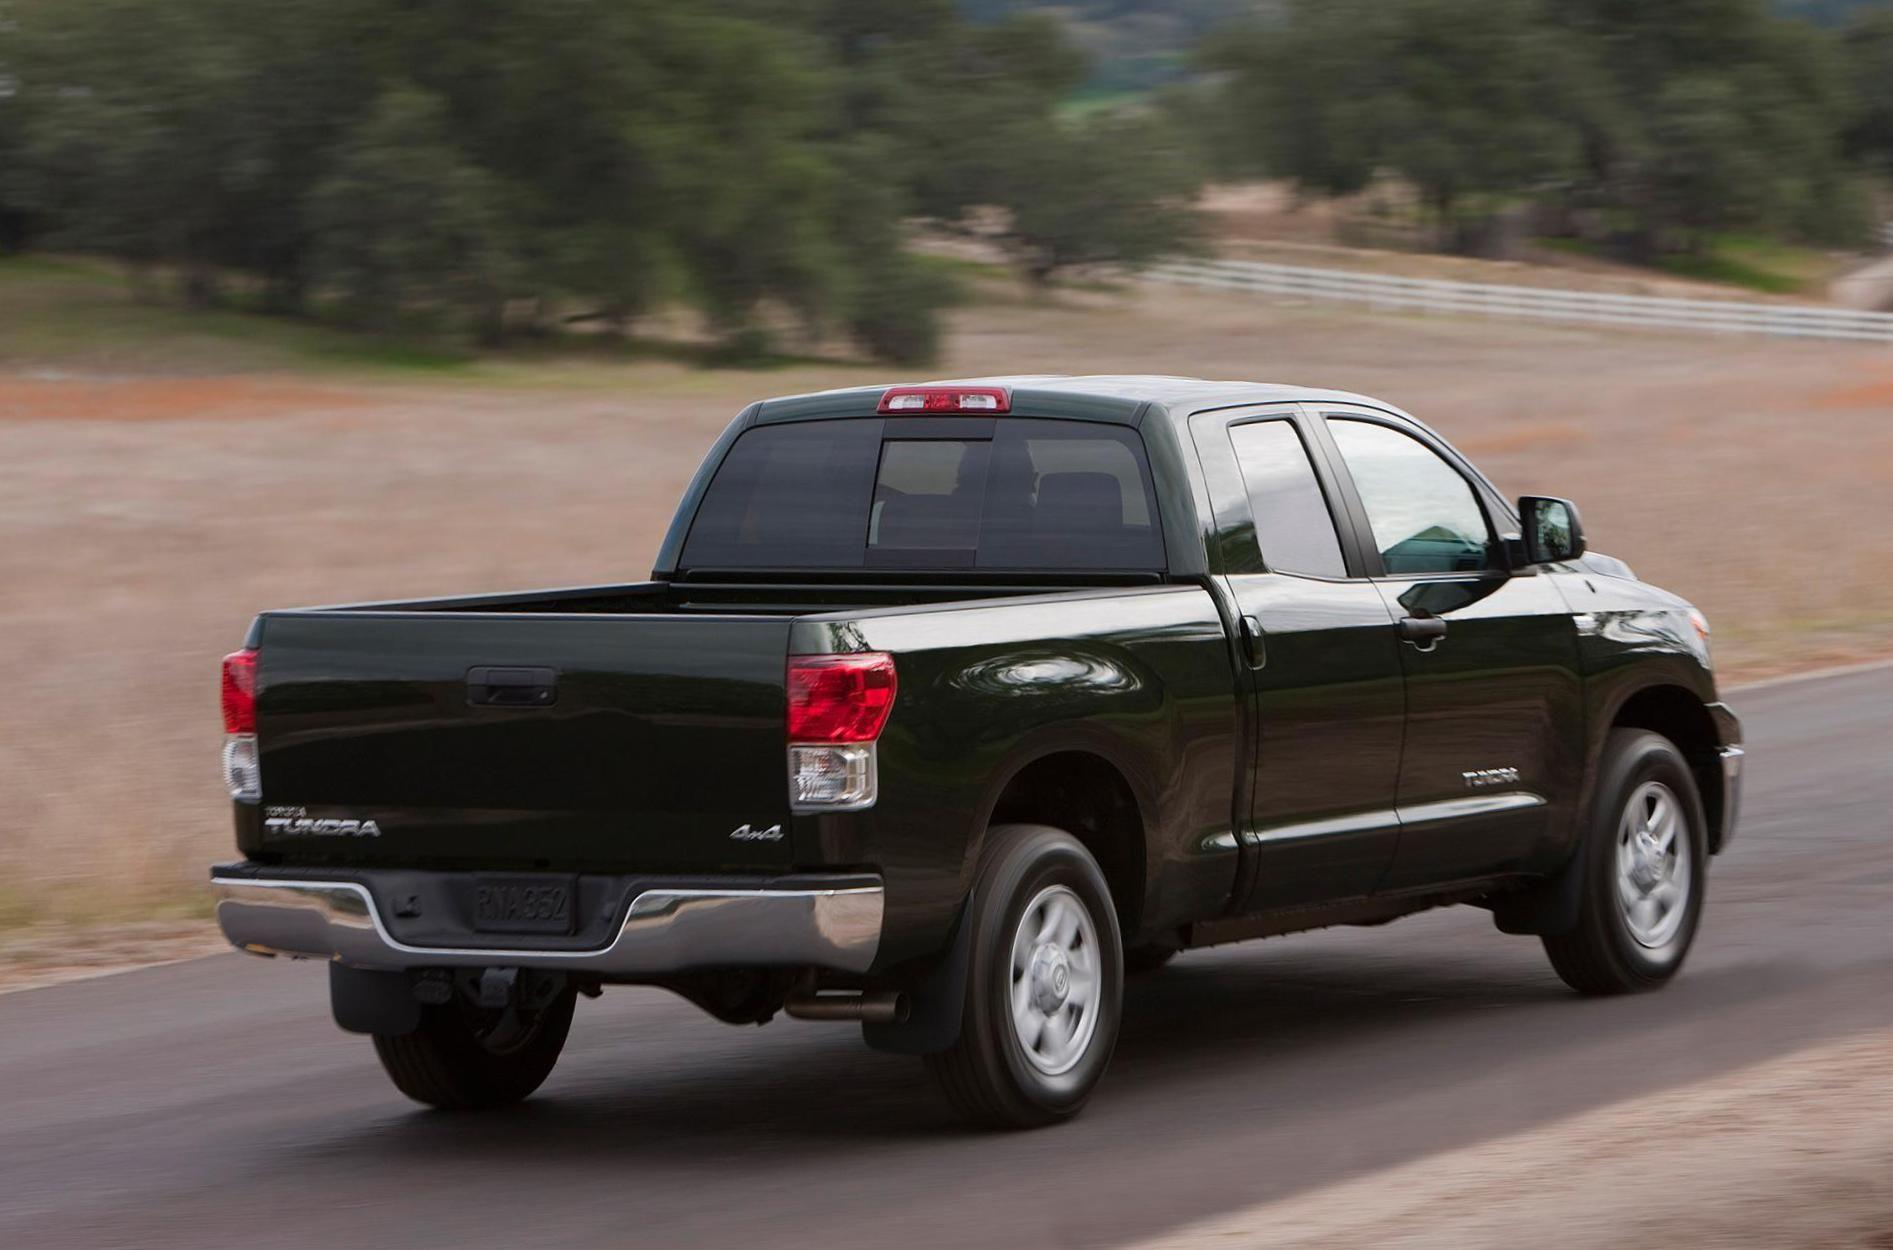 Tundra double cab toyota price http autotras com